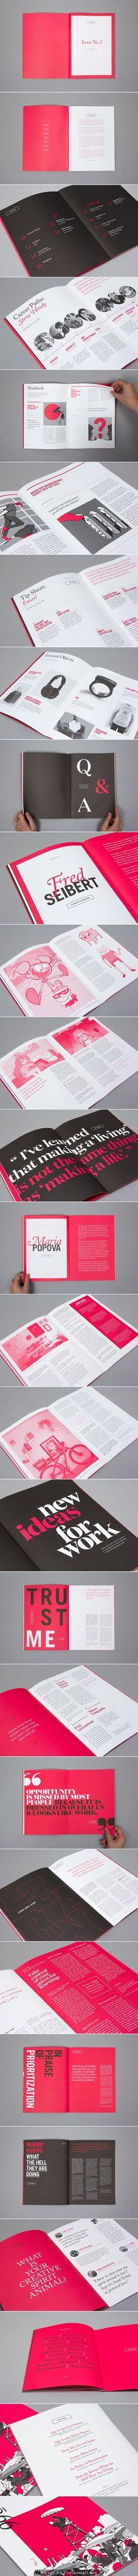 99U Quarterly Magazine :: Issue No.2. Creative direction & design: Raewyn Brandon & Matias Corea. Editorial: Jocelyn K. Glei, Sean Blanda, & Sasha VanHoven. Illustrator: Vincent Mahé.: